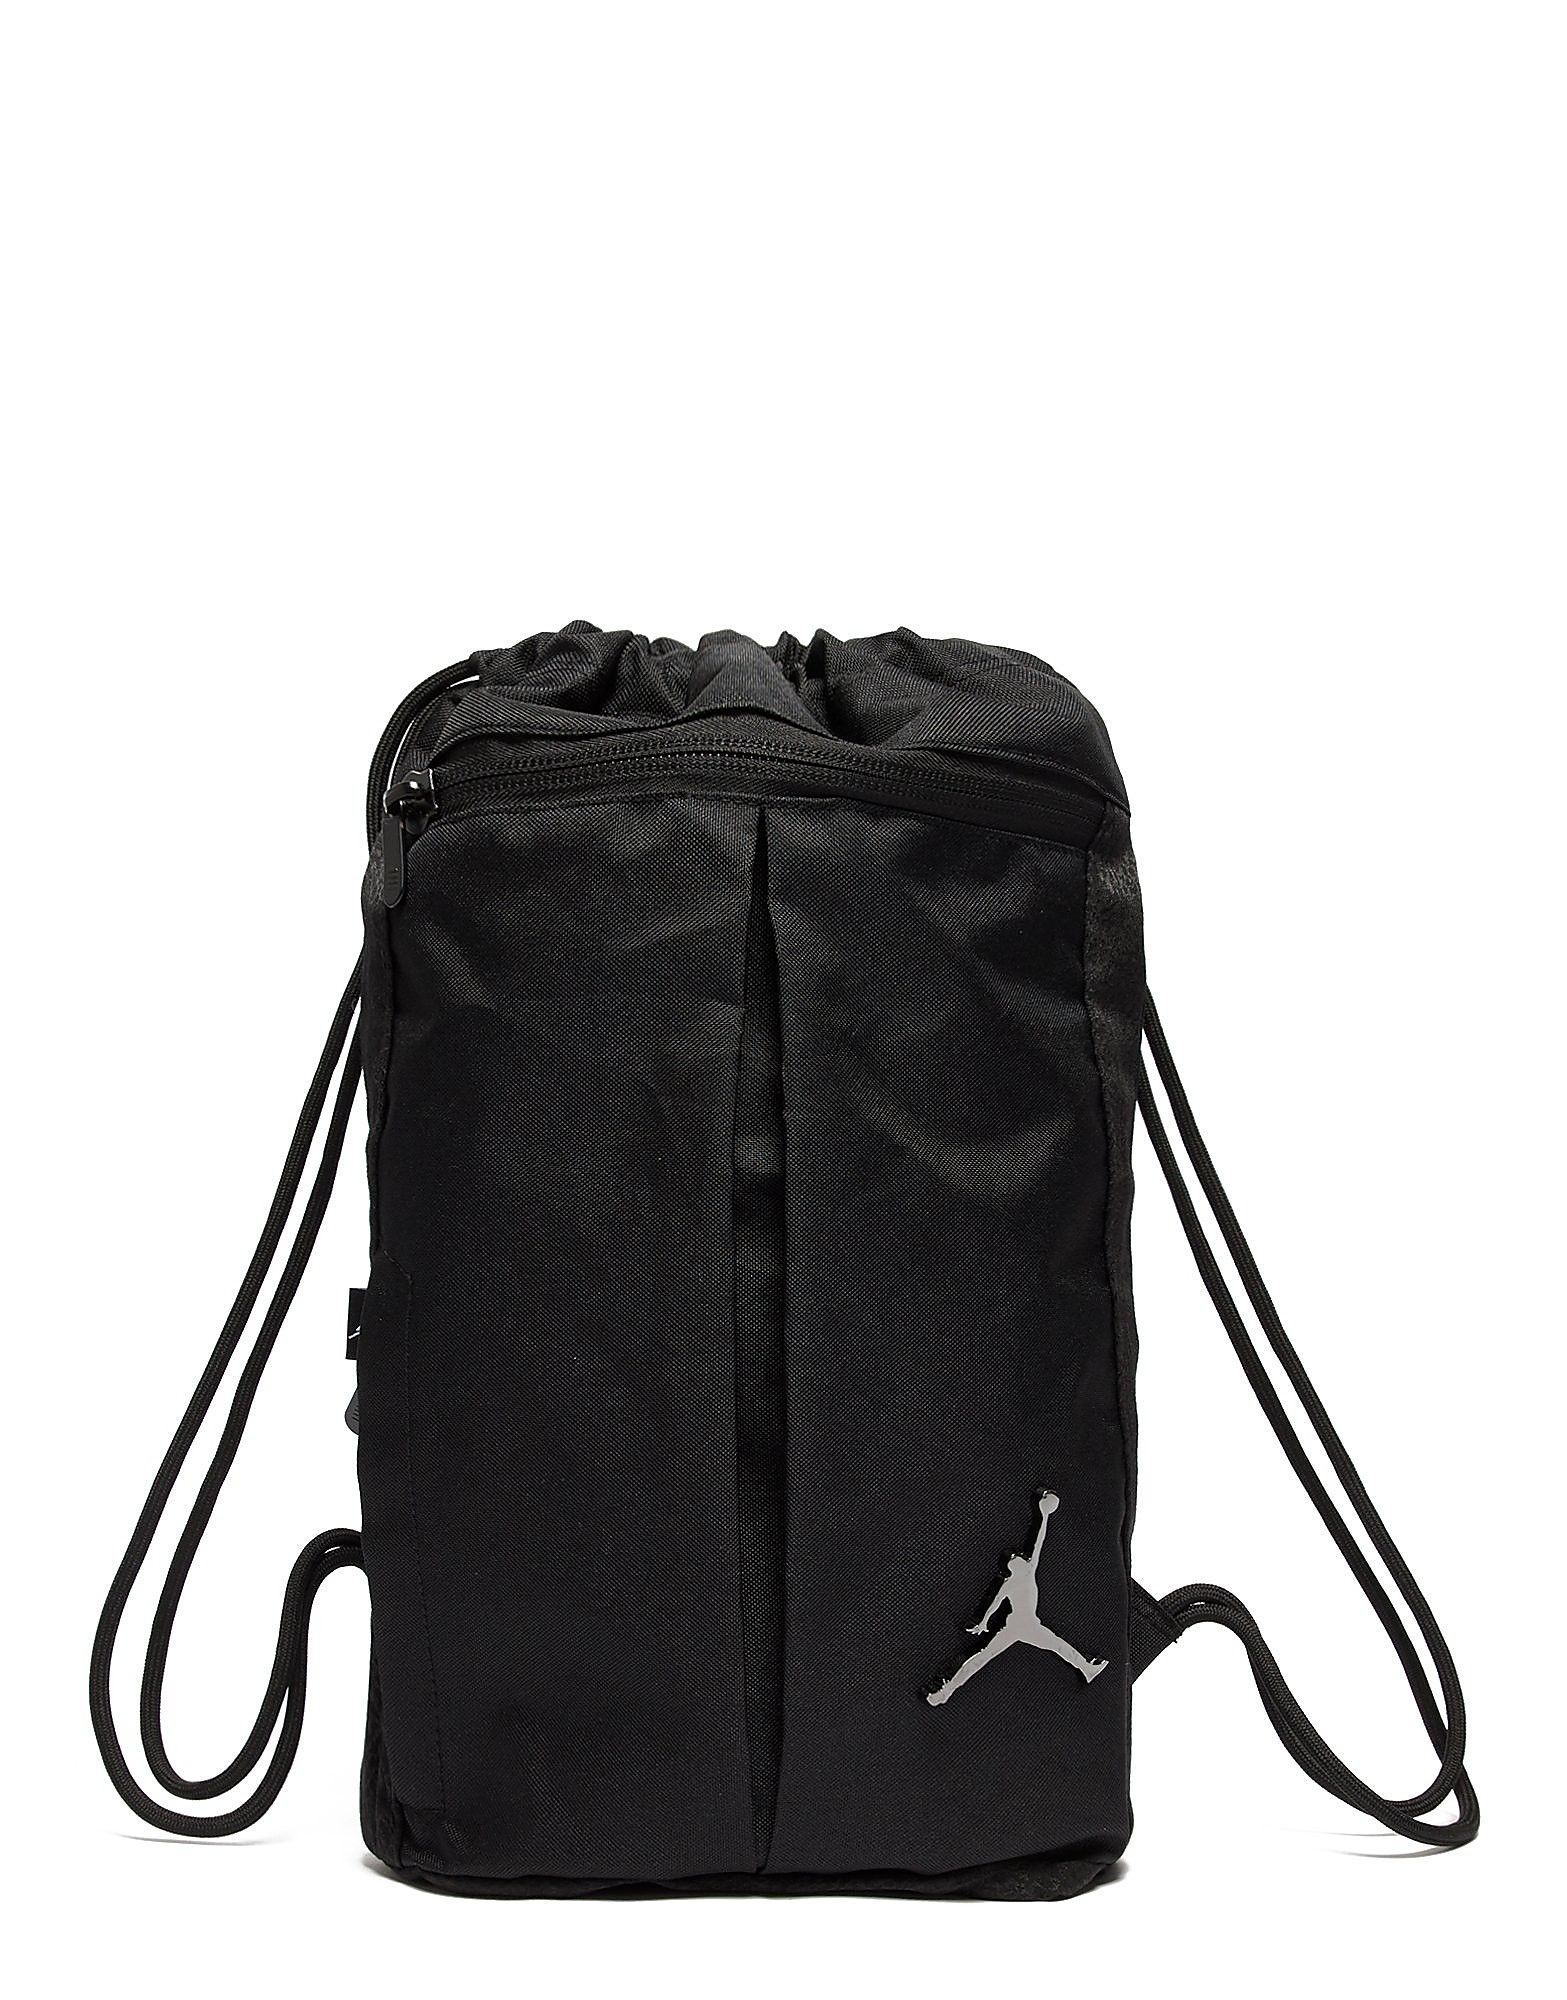 Nike Jordan Unconscious Backpack